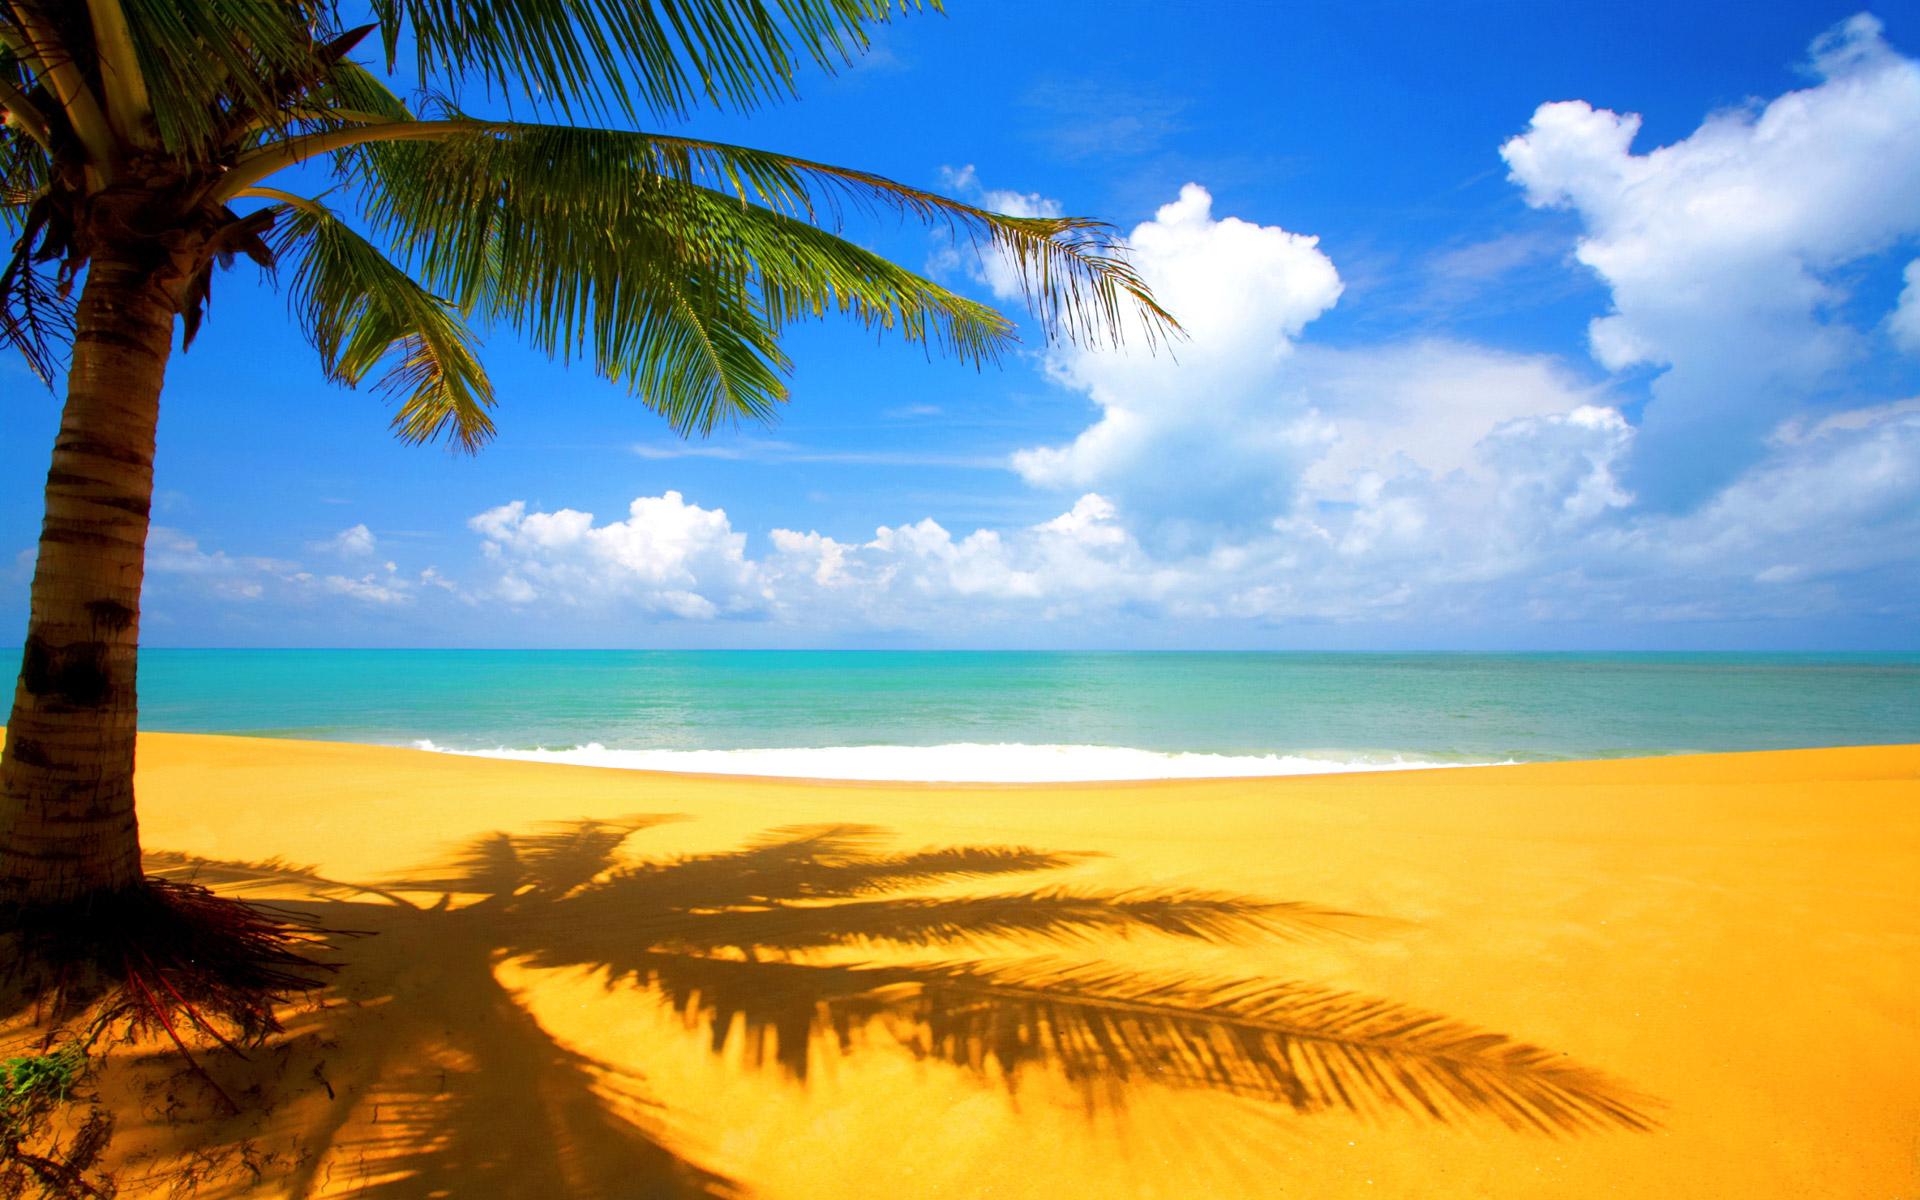 wallpaper of beach scenery a beautiful shadow of palm near beachjpg 1920x1200